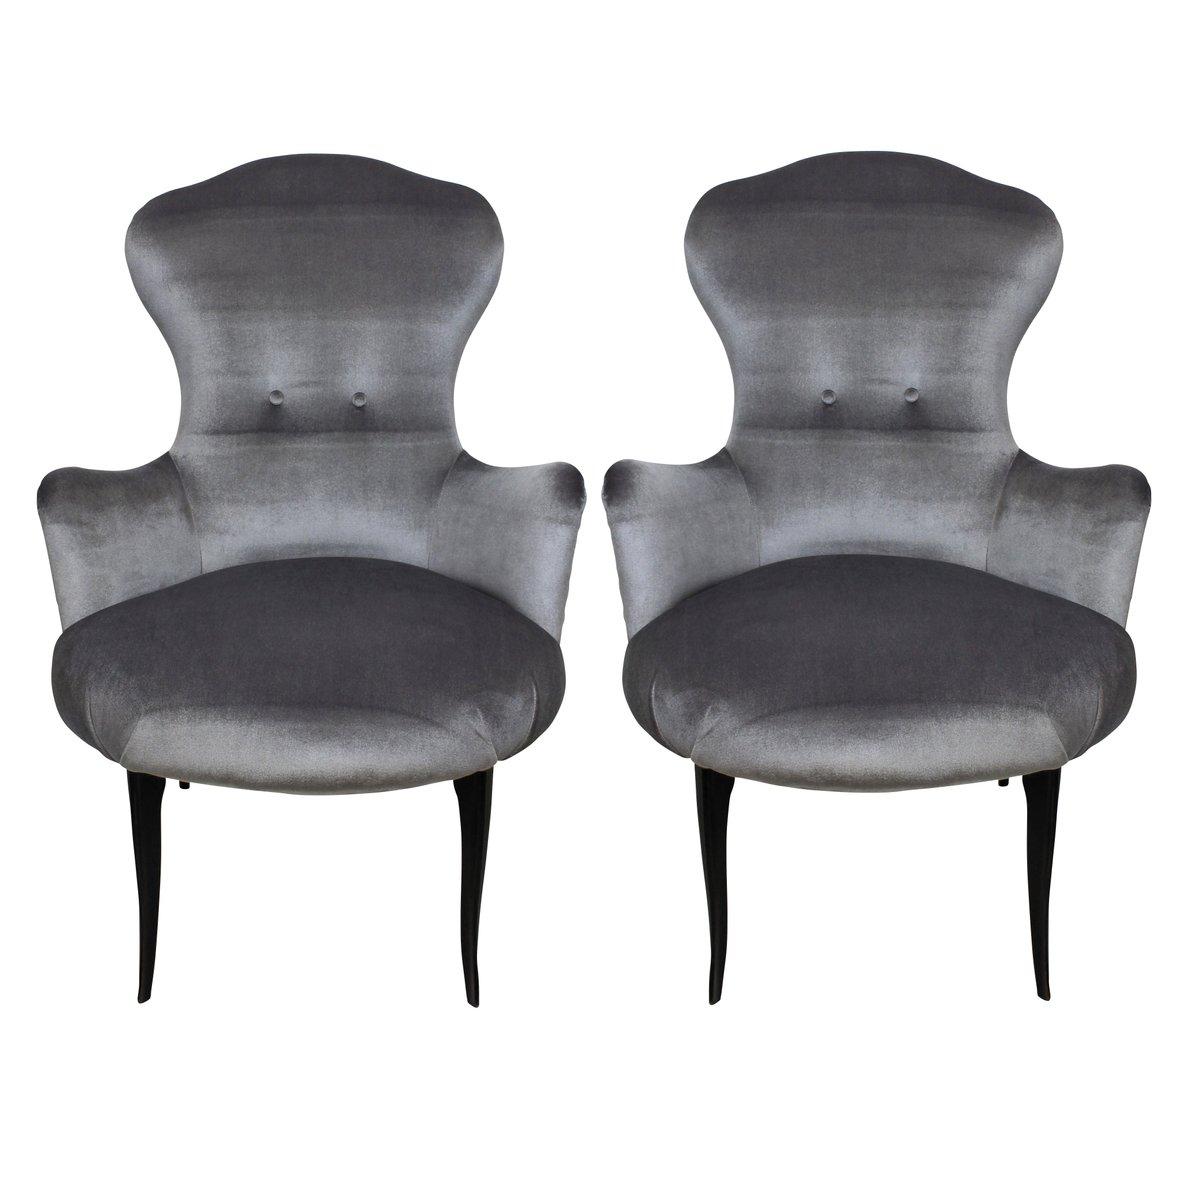 italienische samt sessel 1950er 2er set bei pamono kaufen. Black Bedroom Furniture Sets. Home Design Ideas